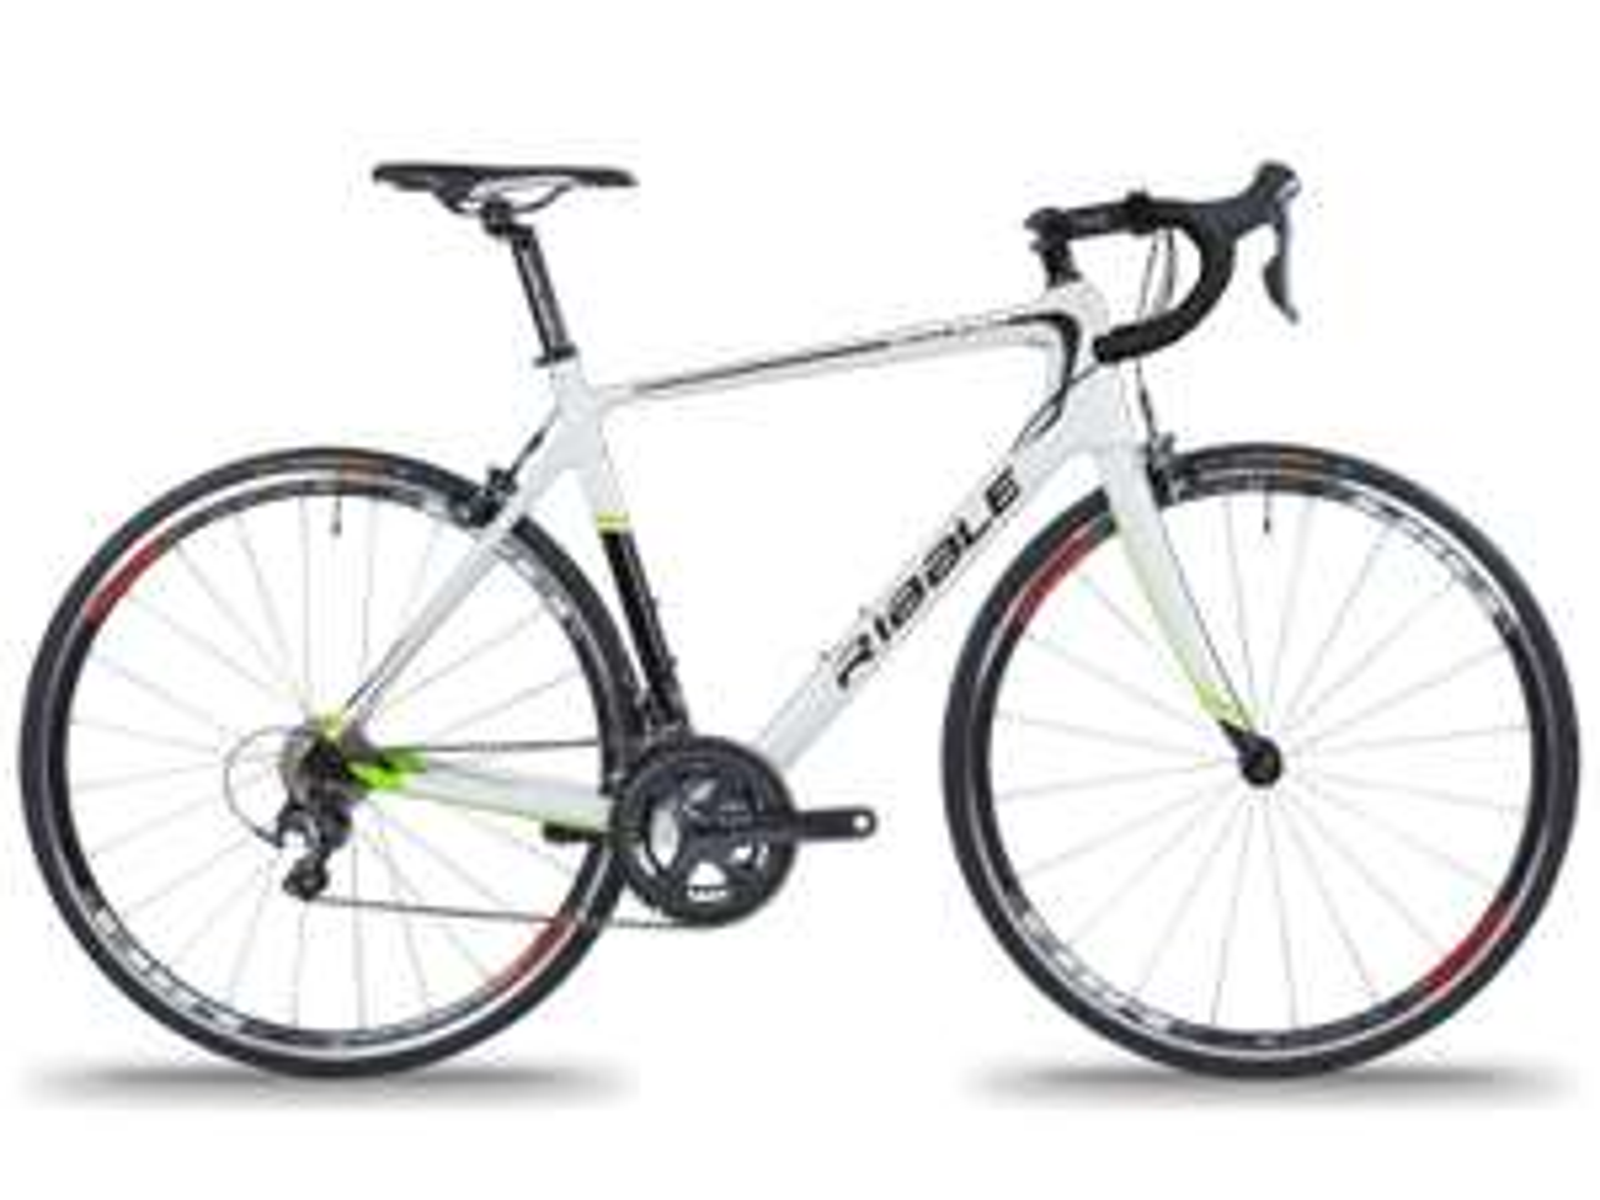 Rower szosowy karbon Ribble Evo Pro Tiagra SE @Ribble 3600 PLN